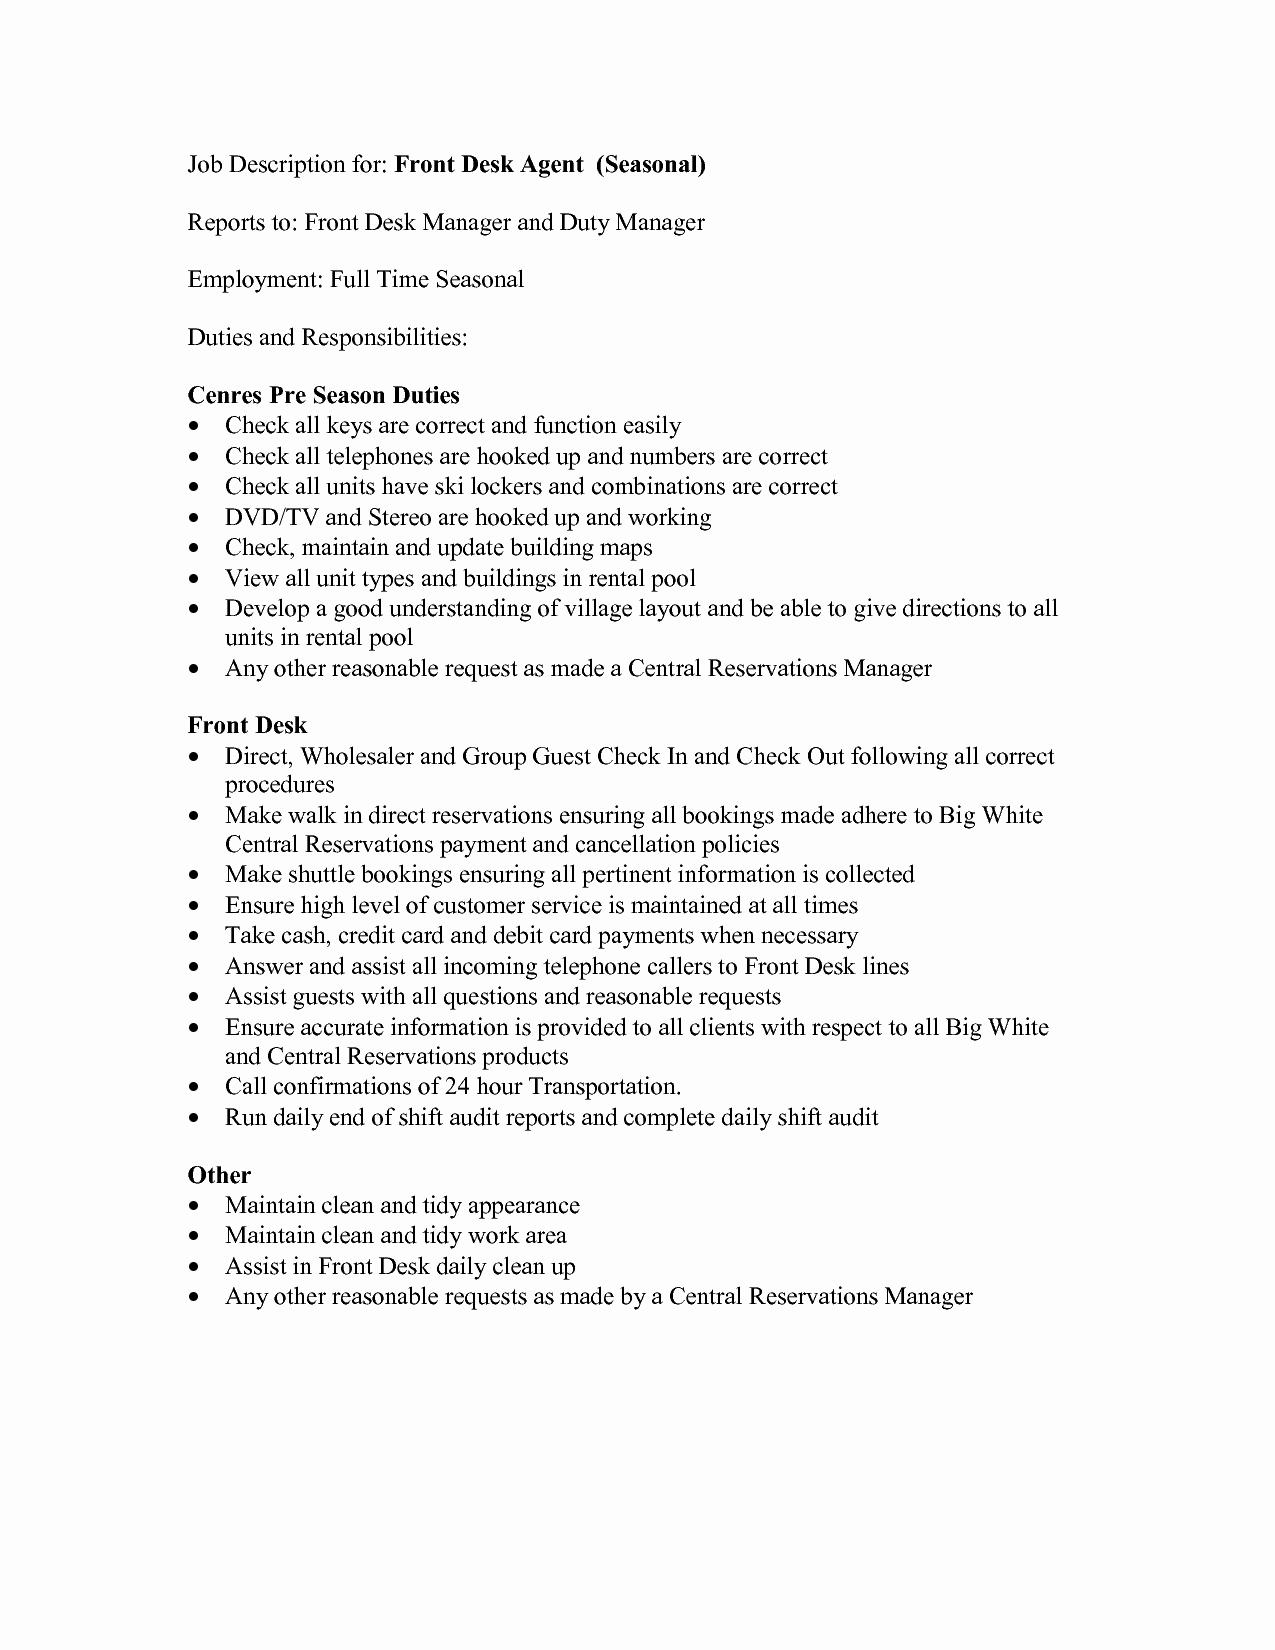 Hotel Front Desk Job Description